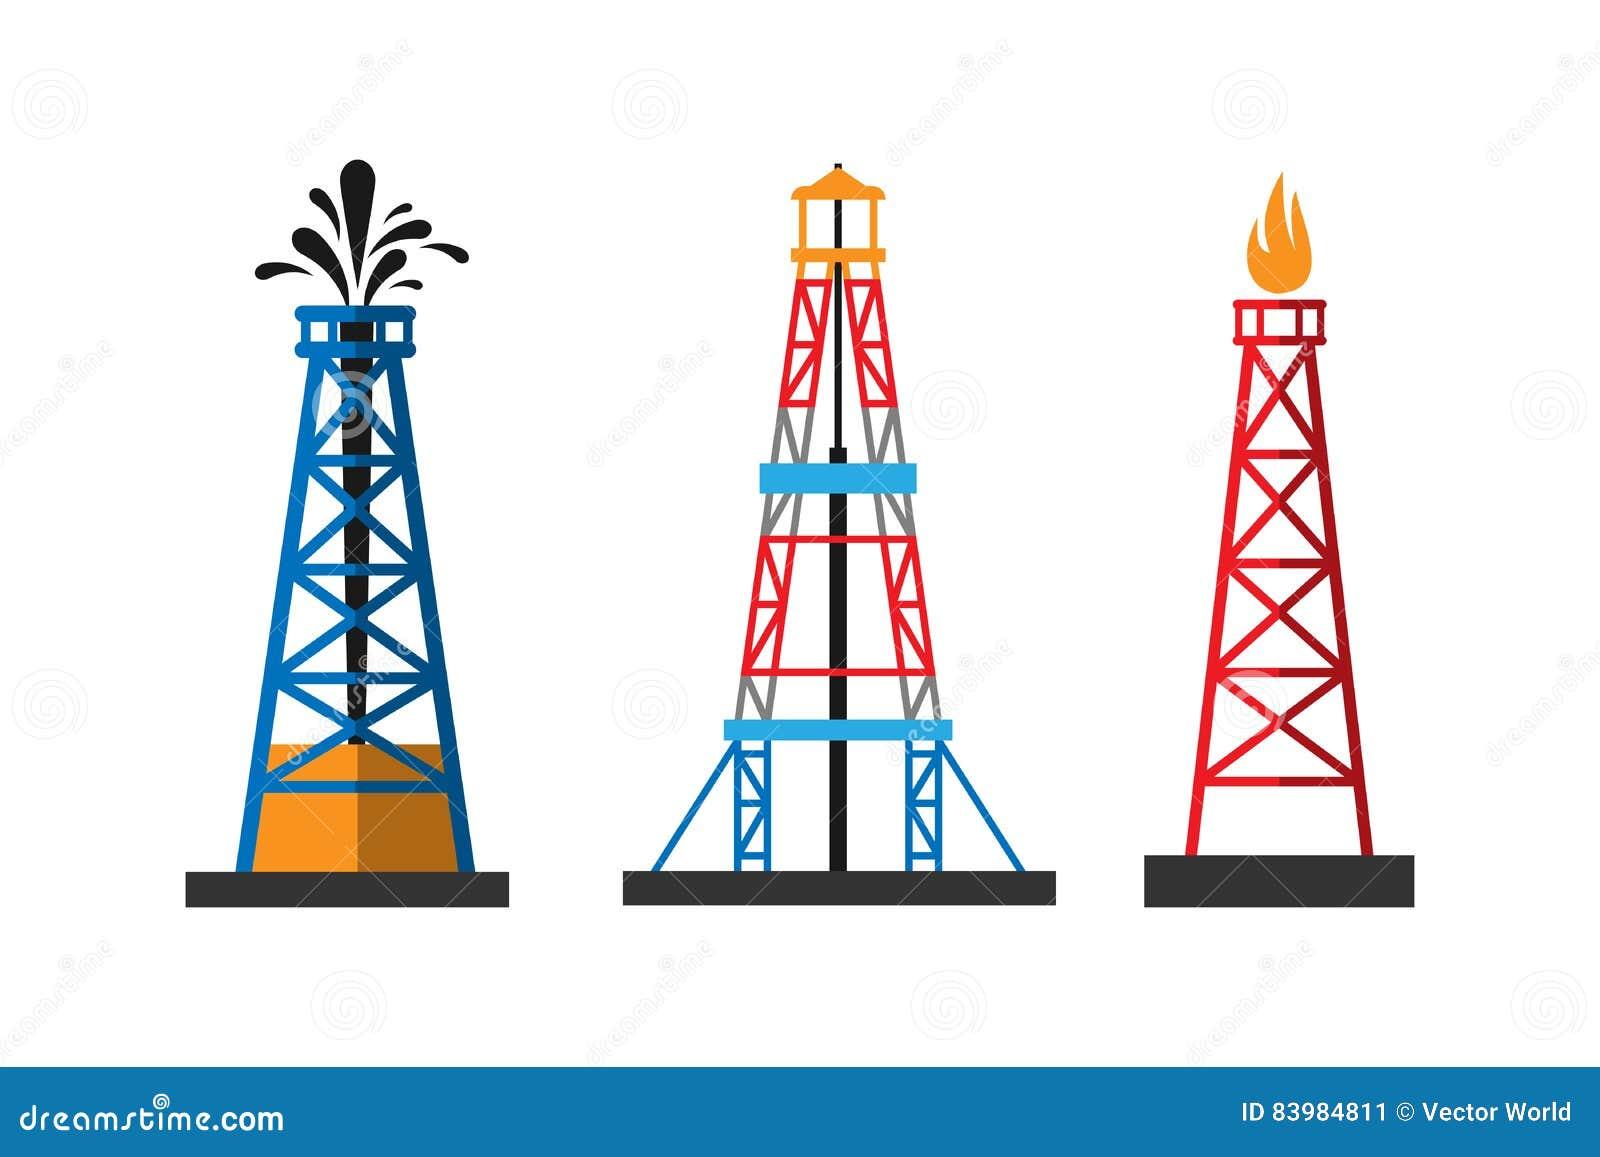 Oil Extraction Platform Vector Illustration Stock Vector ...